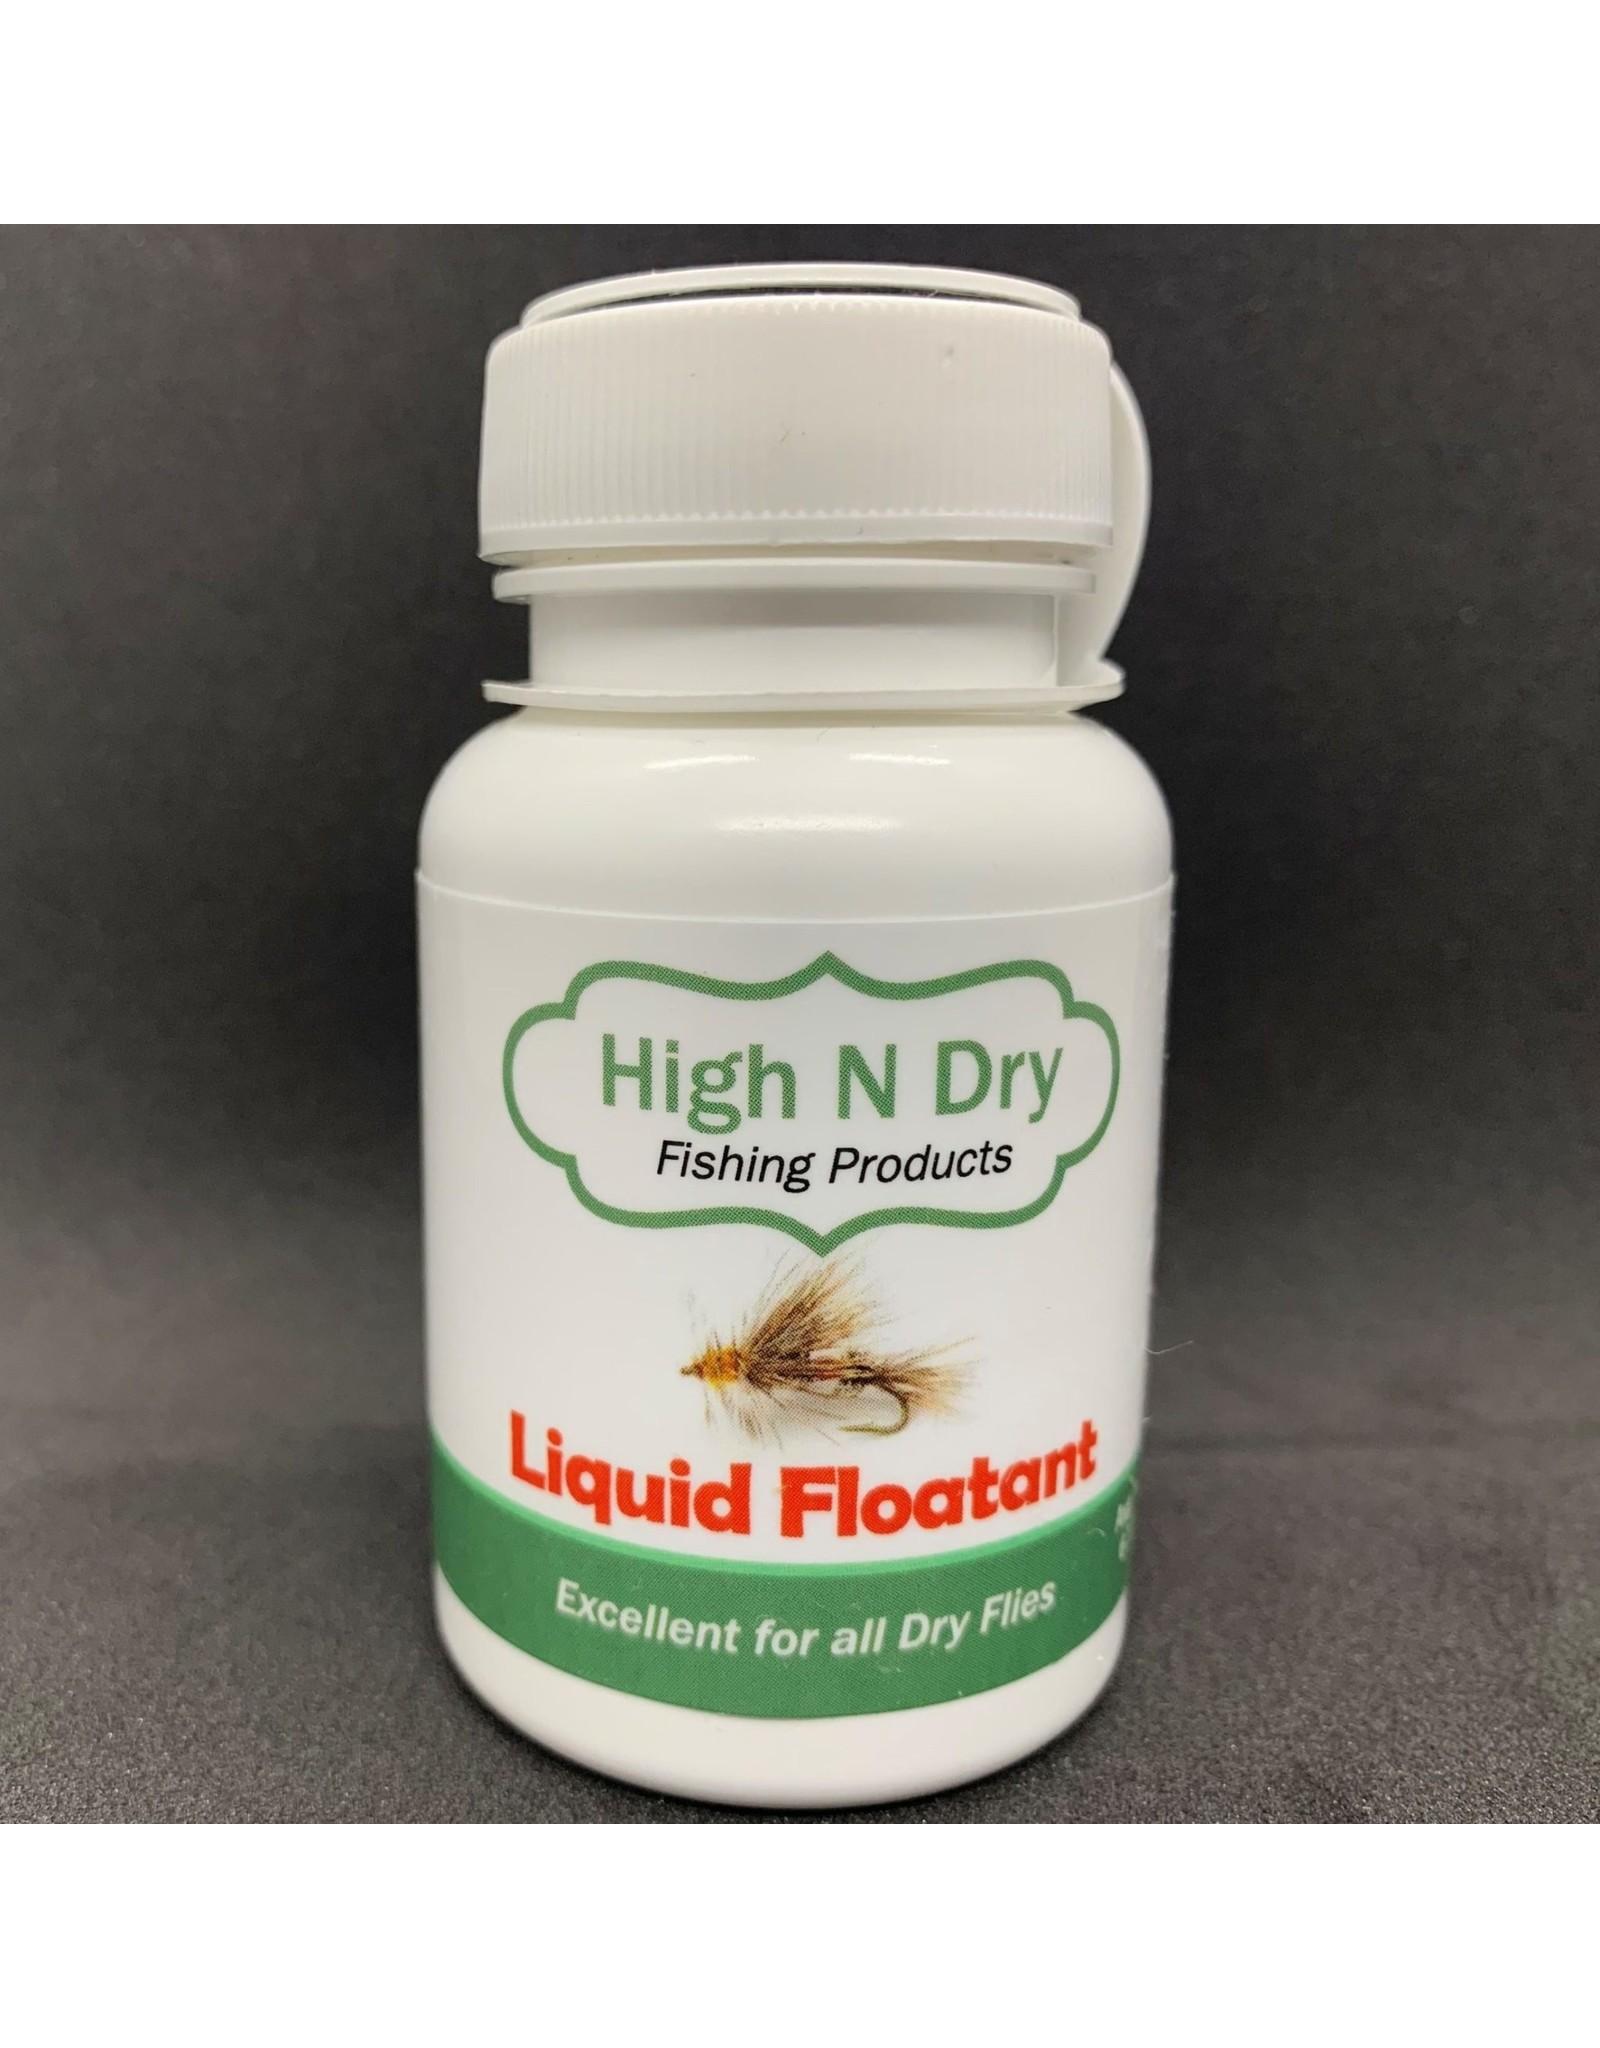 HIGH N DRY FISHING PRODUCTS HIGH N DRY LIQUID FLOATANT